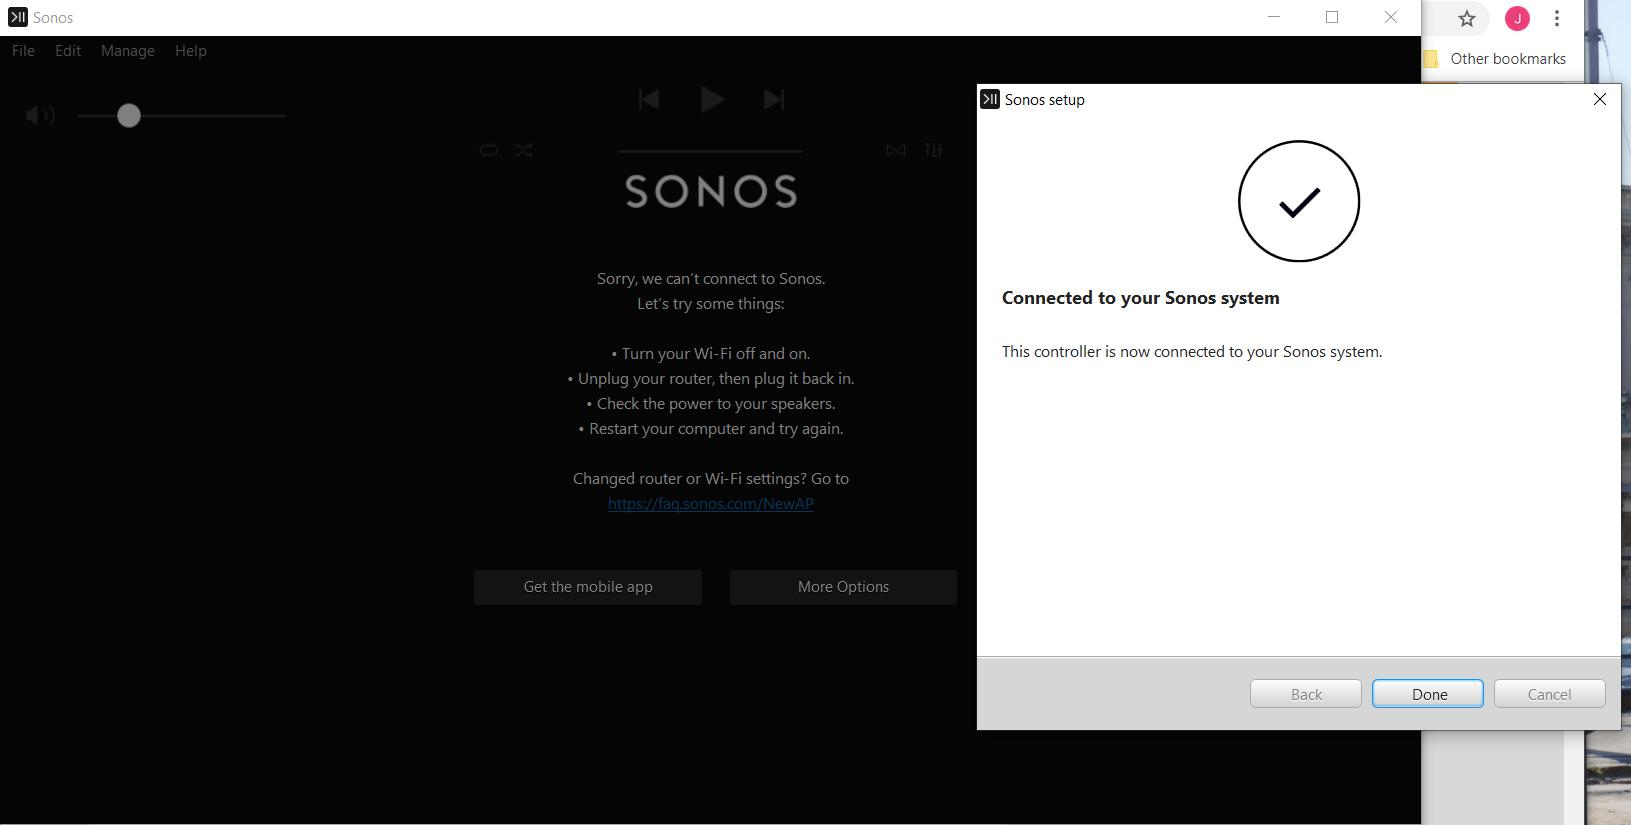 Windows 10 Controller completely useless again | Sonos